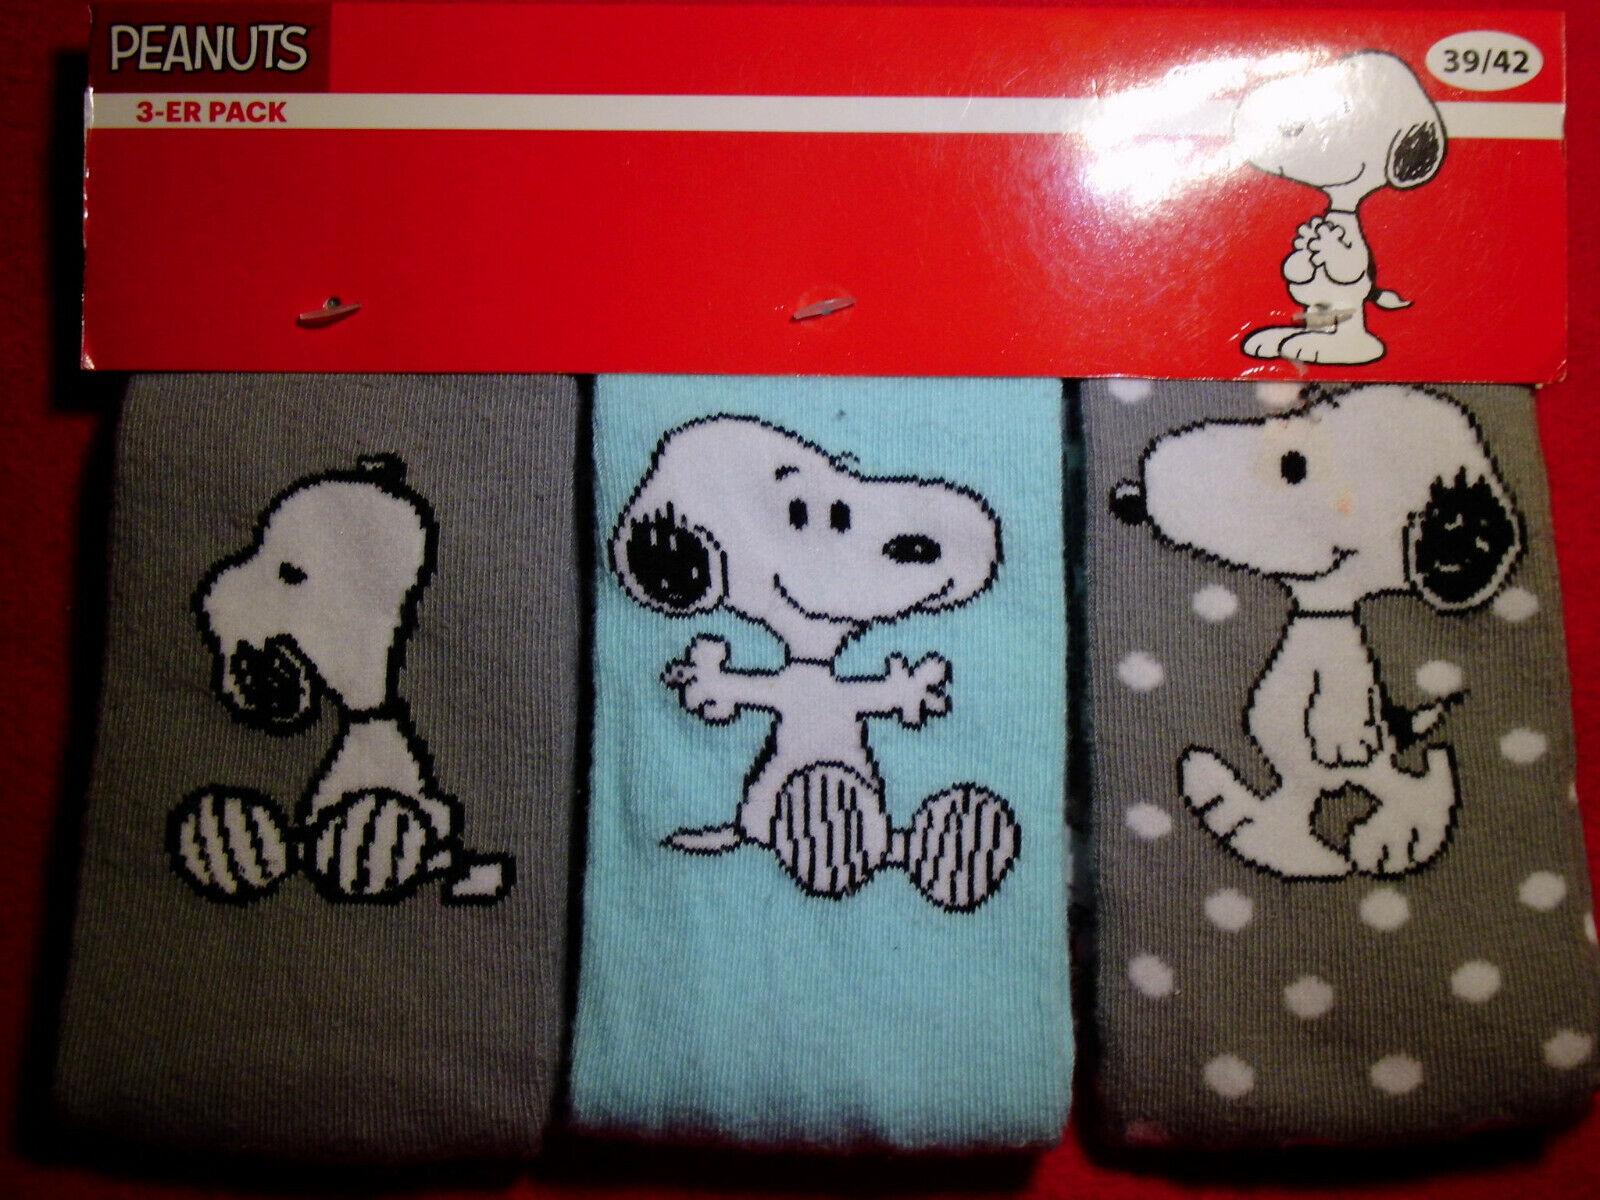 NEU Snoopy Peanuts Gr.39-42 3 PAAR Damen Comic Socken Strümpfe so süß